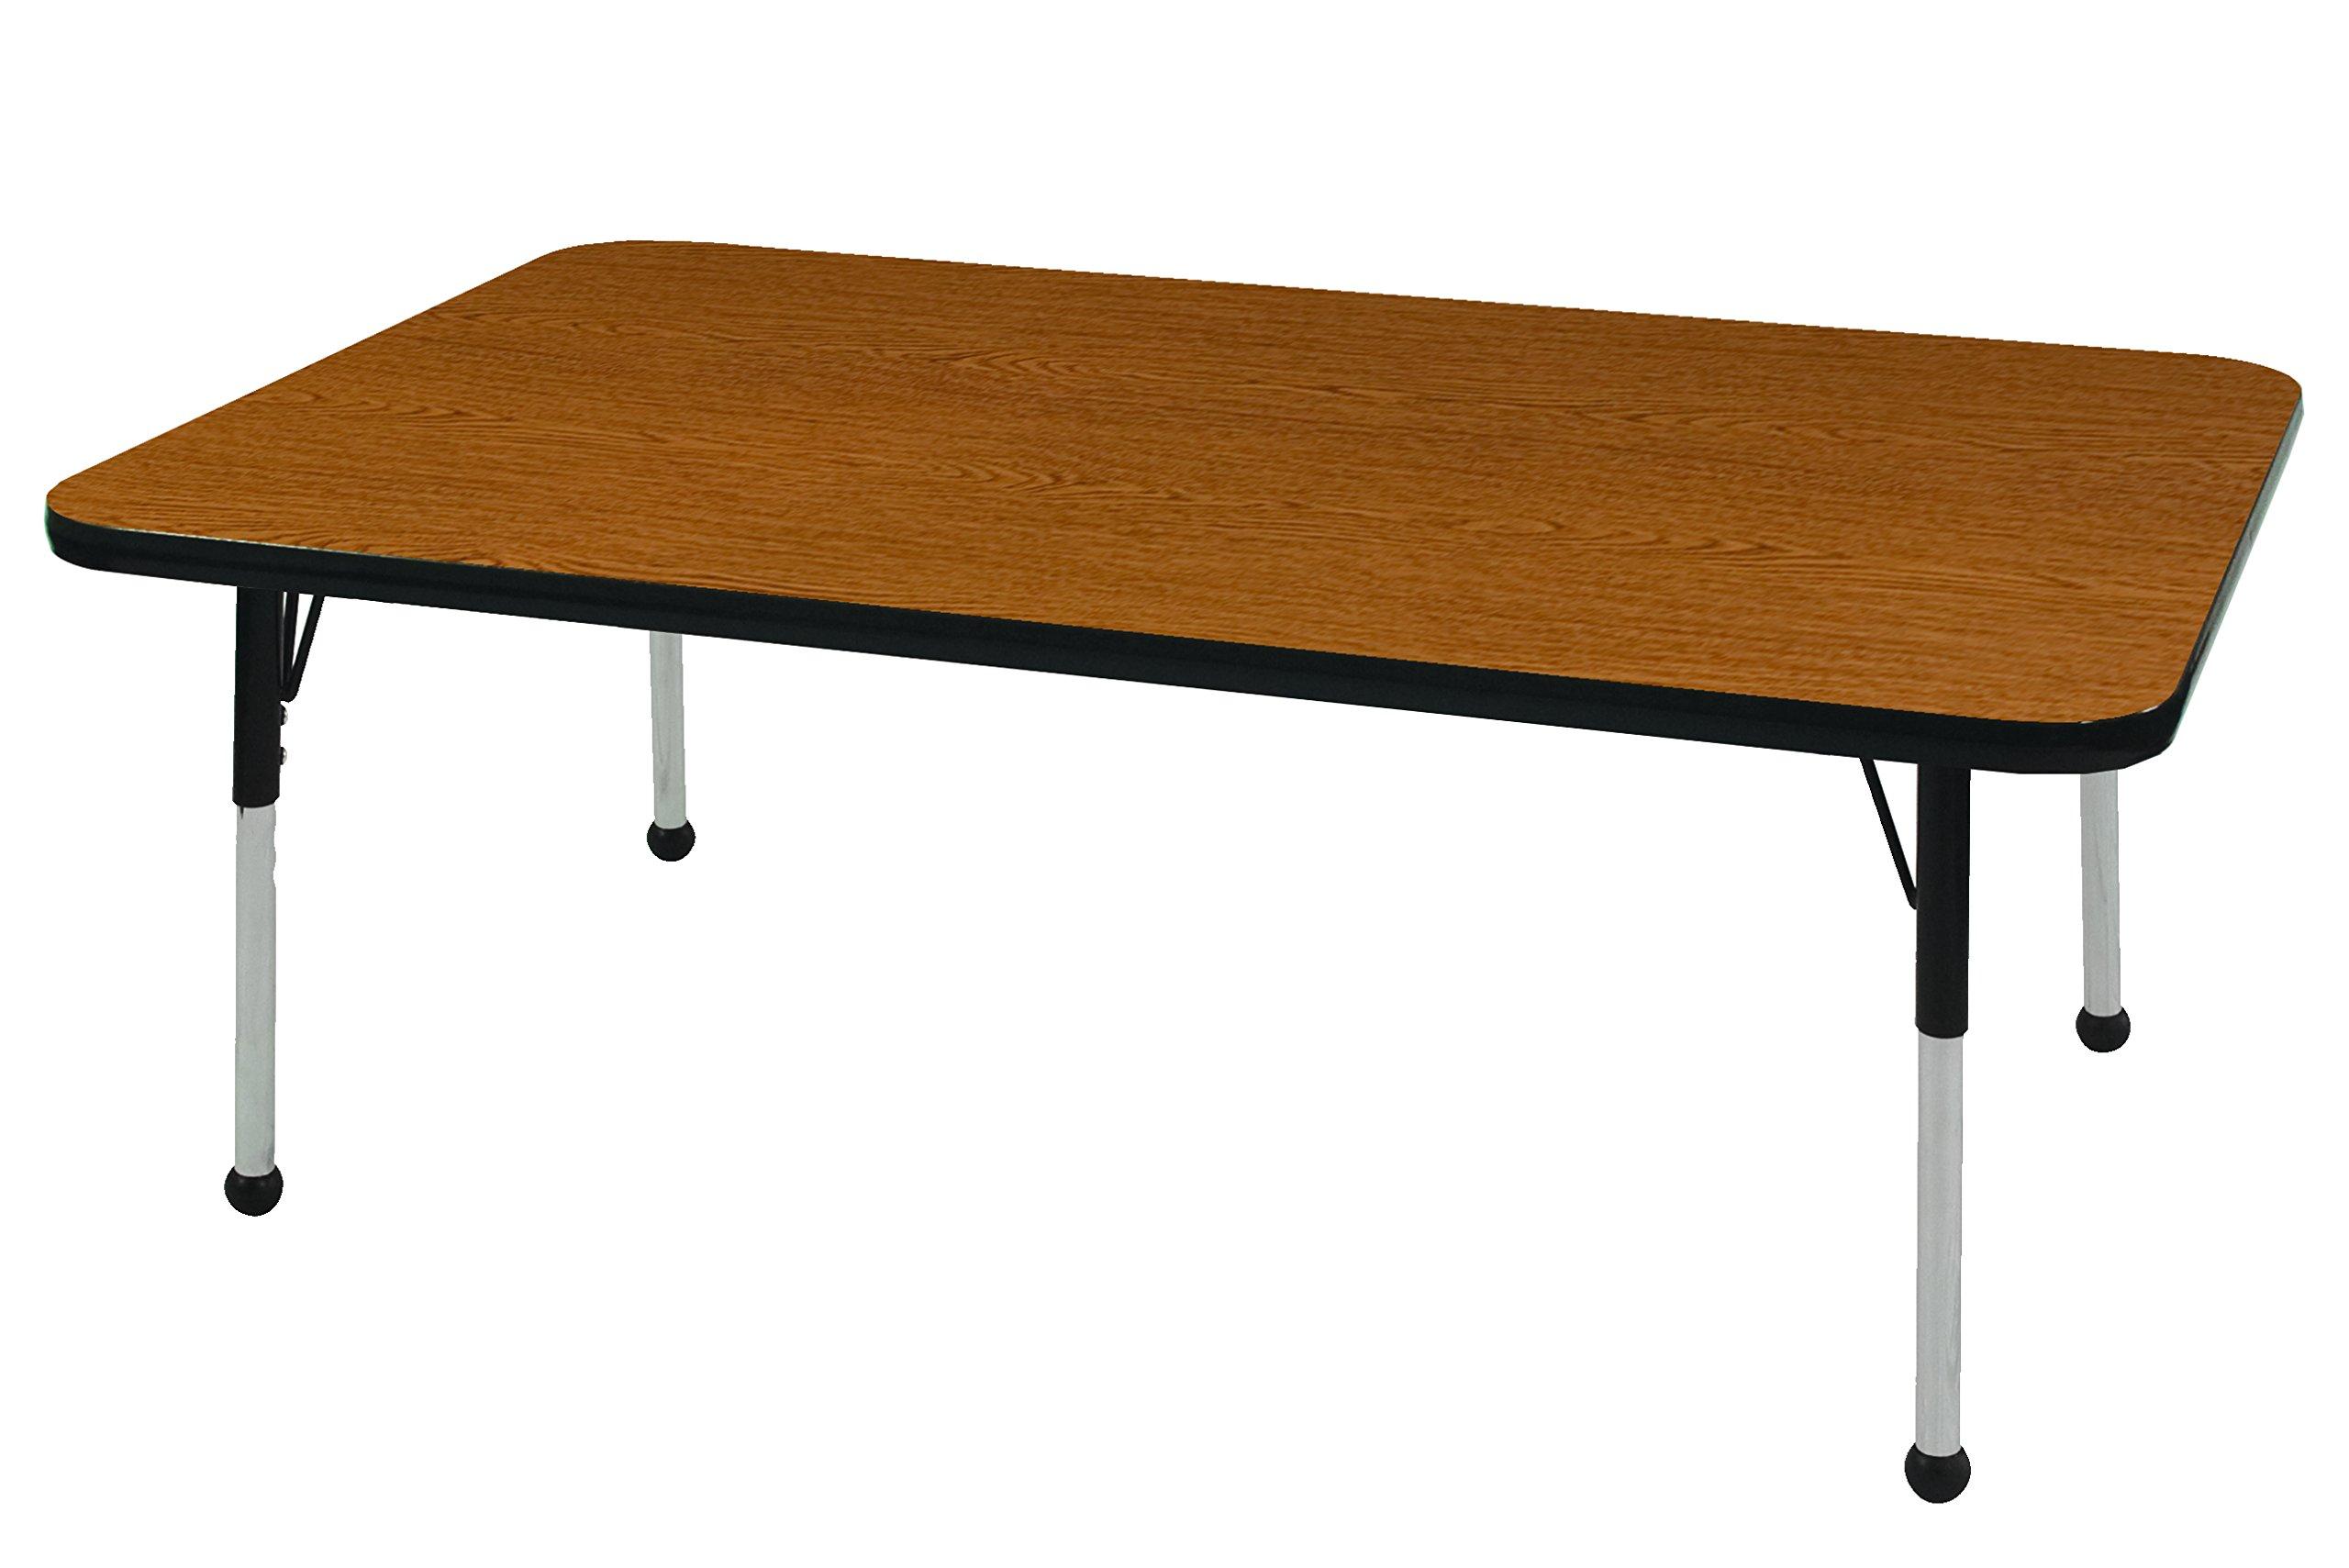 ECR4Kids Mesa T-Mold 30'' x 48'' Rectangular School Activity Table, Toddler Legs w/ Ball Glides, Adjustable Height 15-23 inch (Oak/Black)